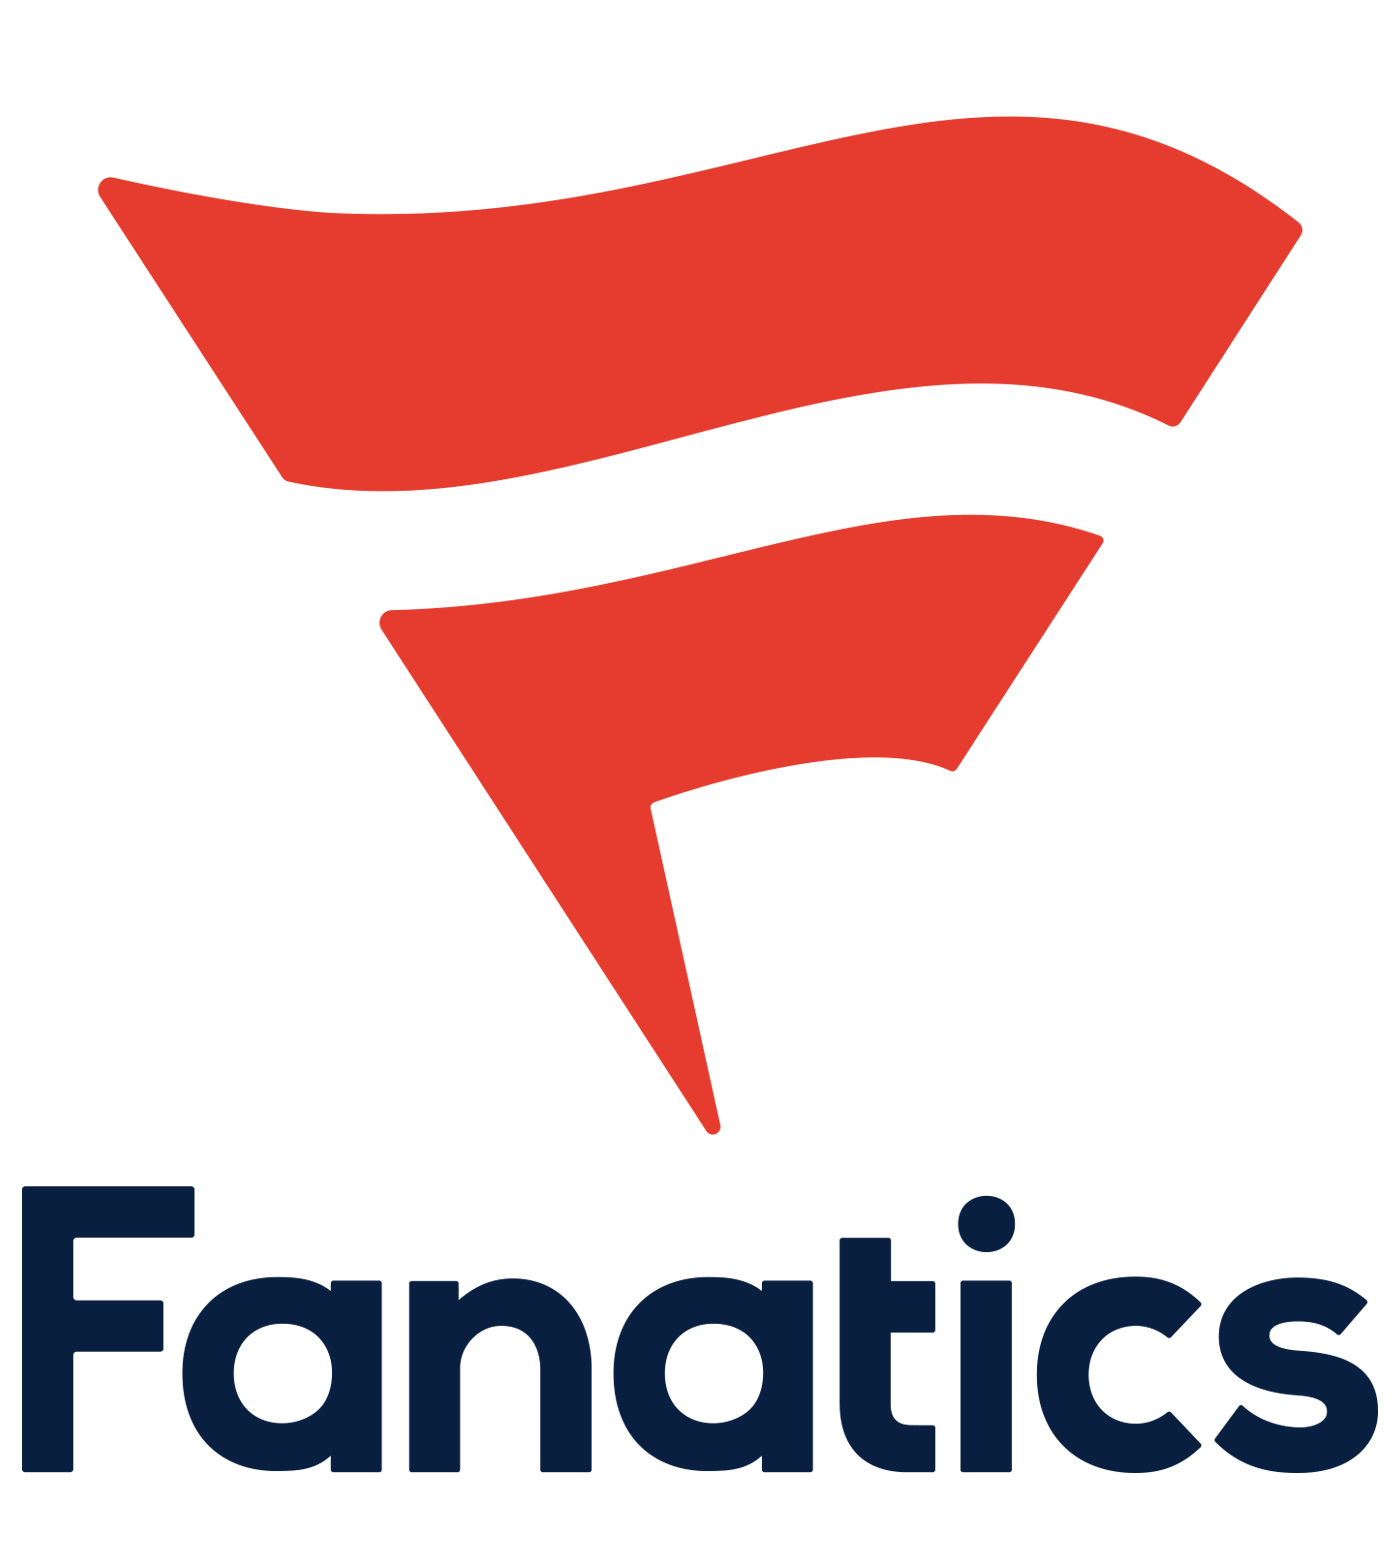 Fanatic Vs